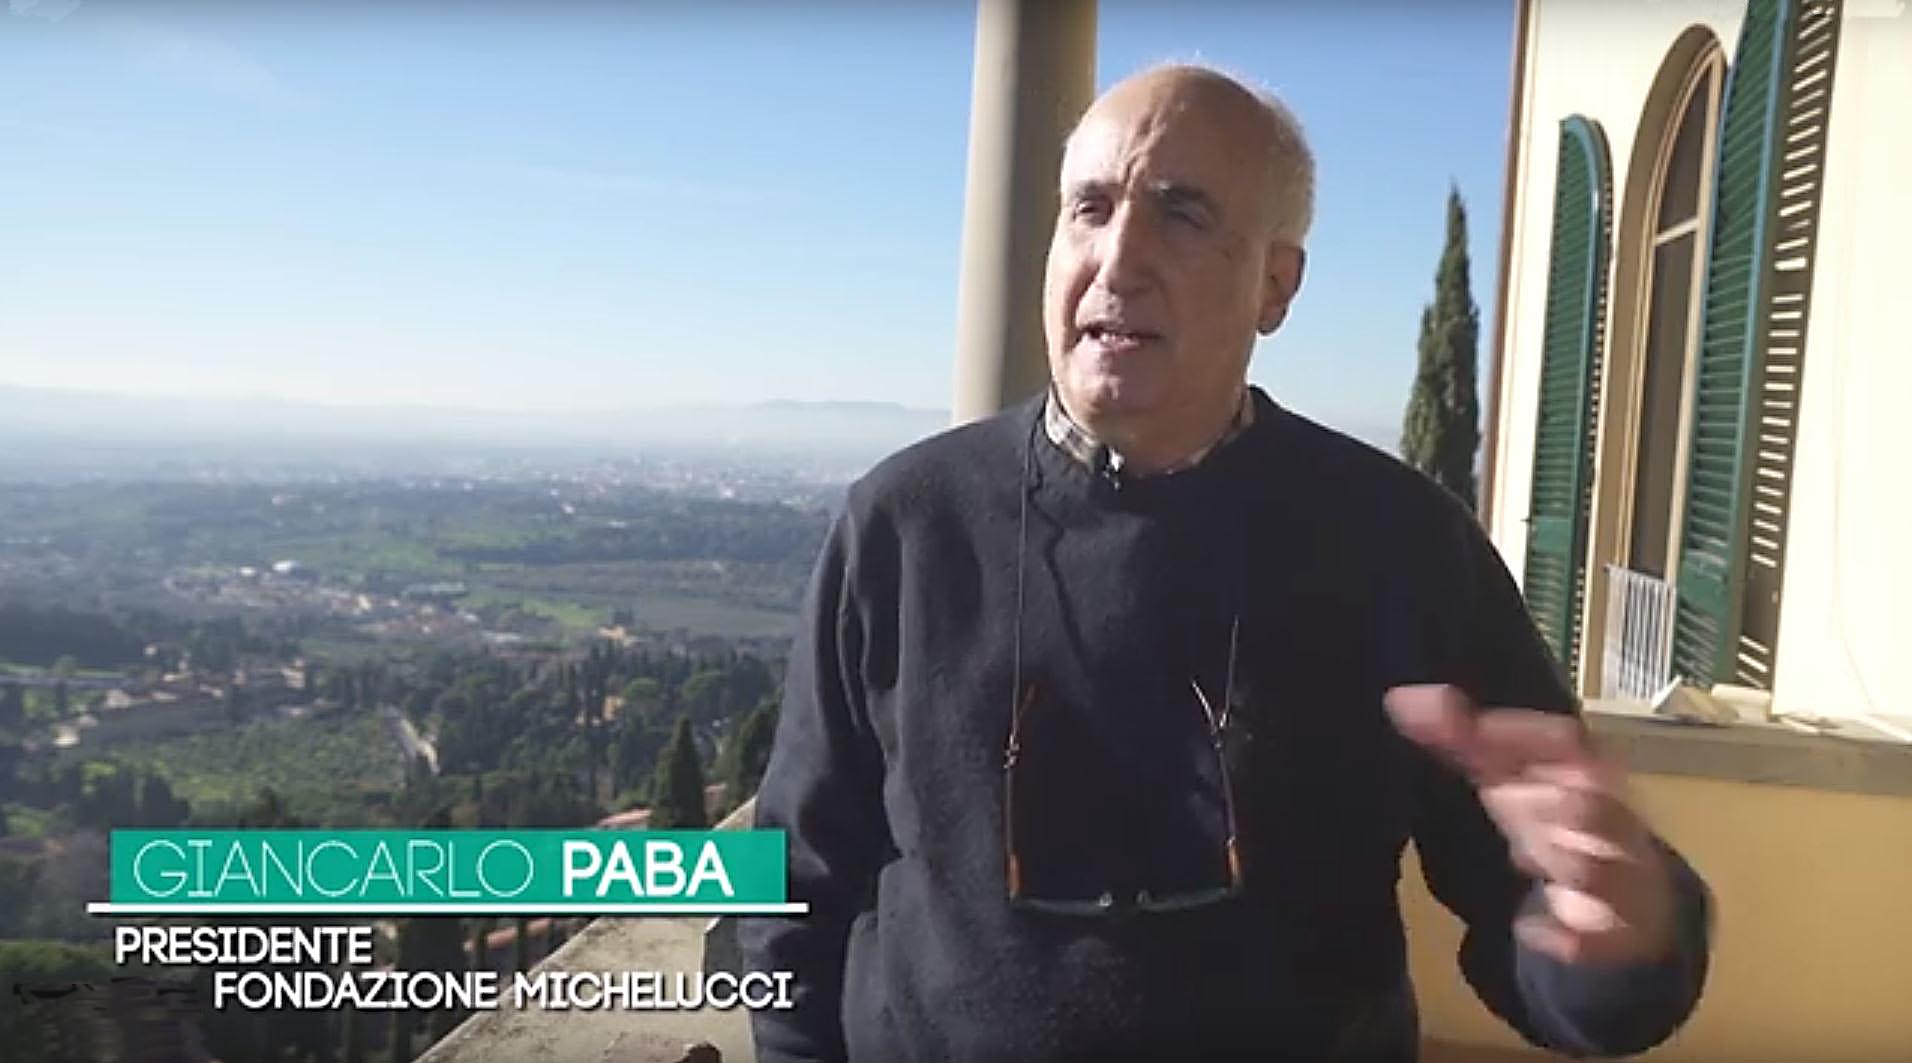 Giancarlo Paba